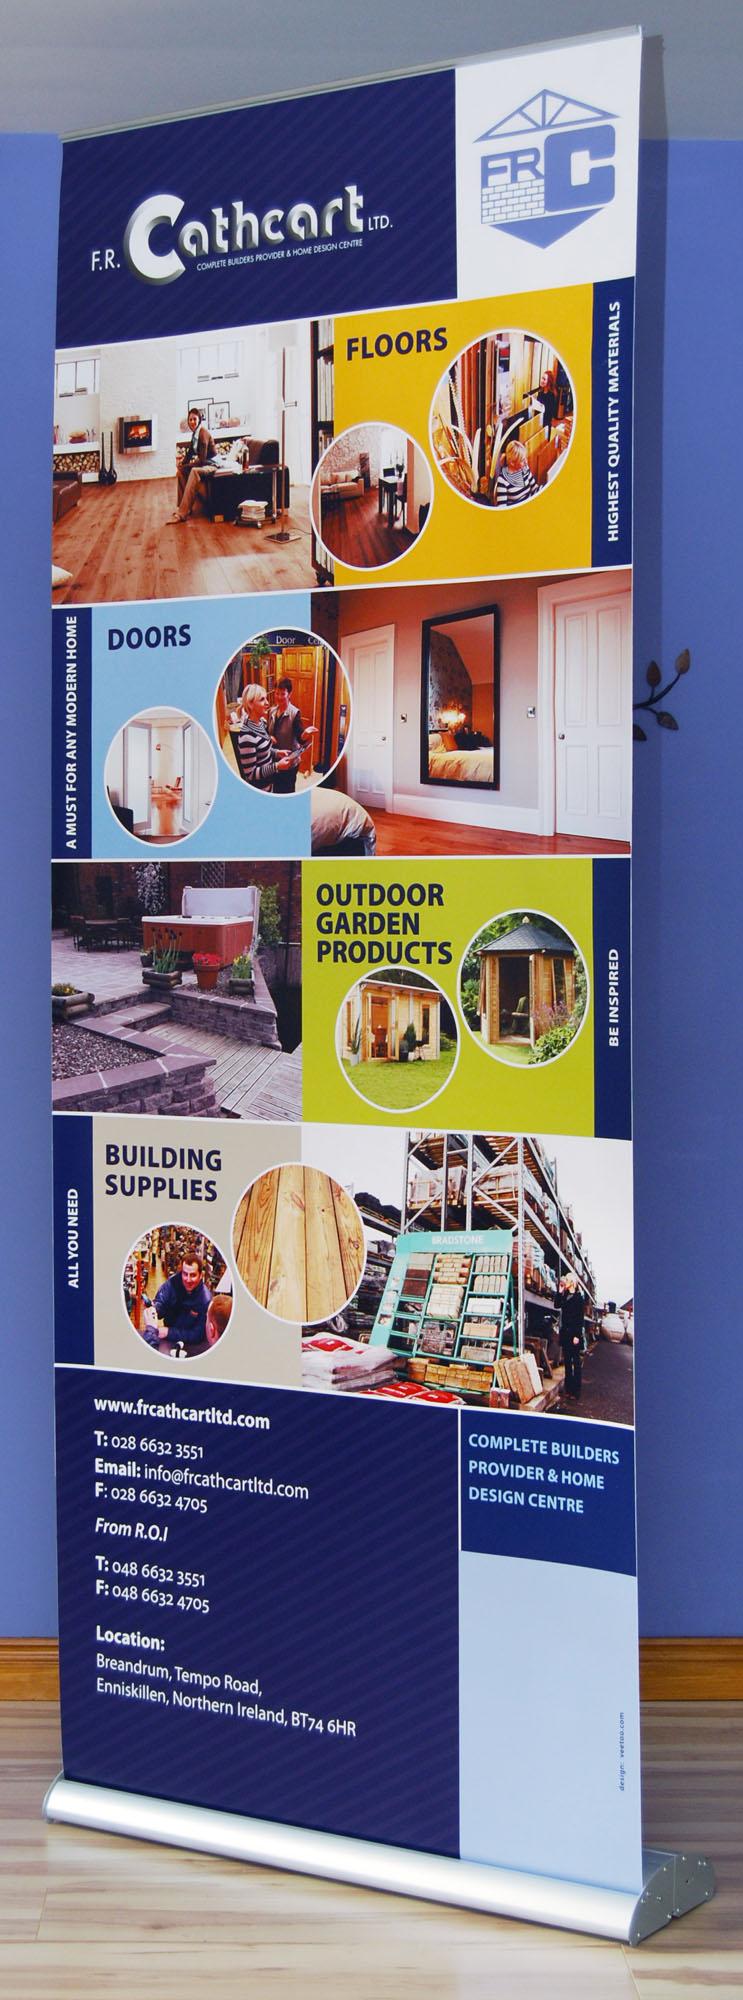 Graphic designers Belfast design 6b photo